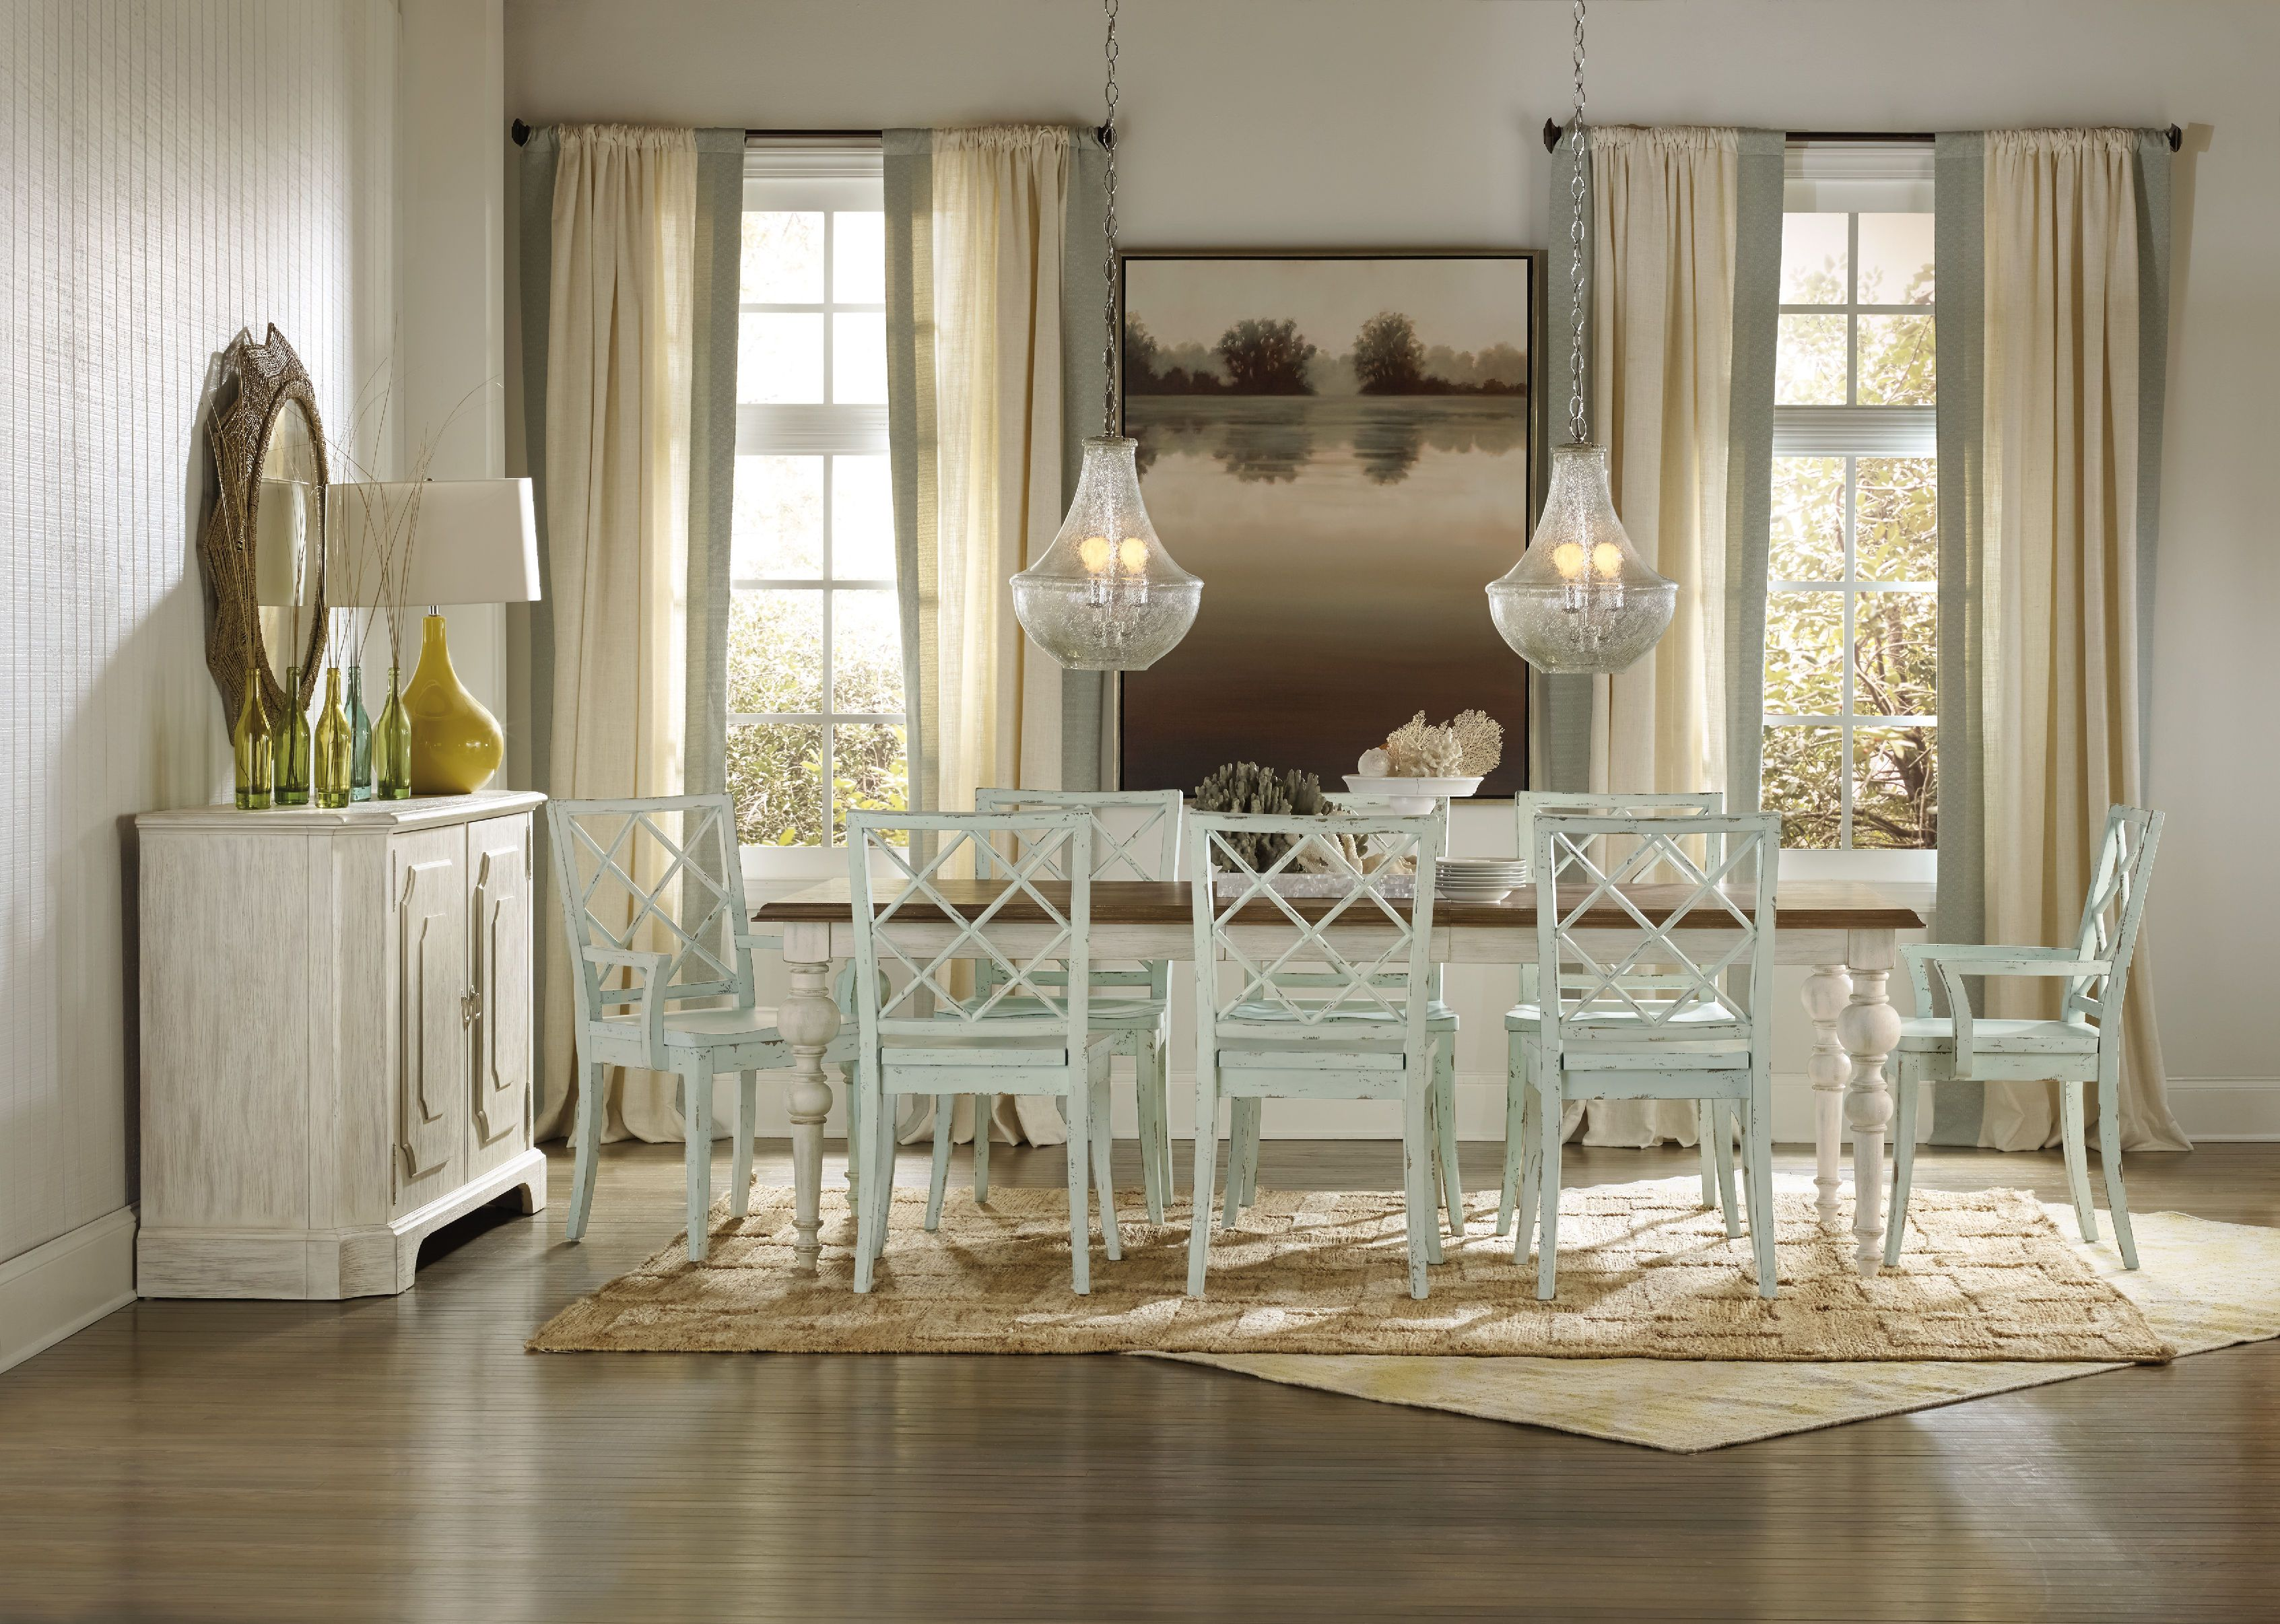 Hooker Furniture Dining Room Sunset Point Rectangle Dining Table Inspiration Rectangle Dining Room Tables Design Ideas